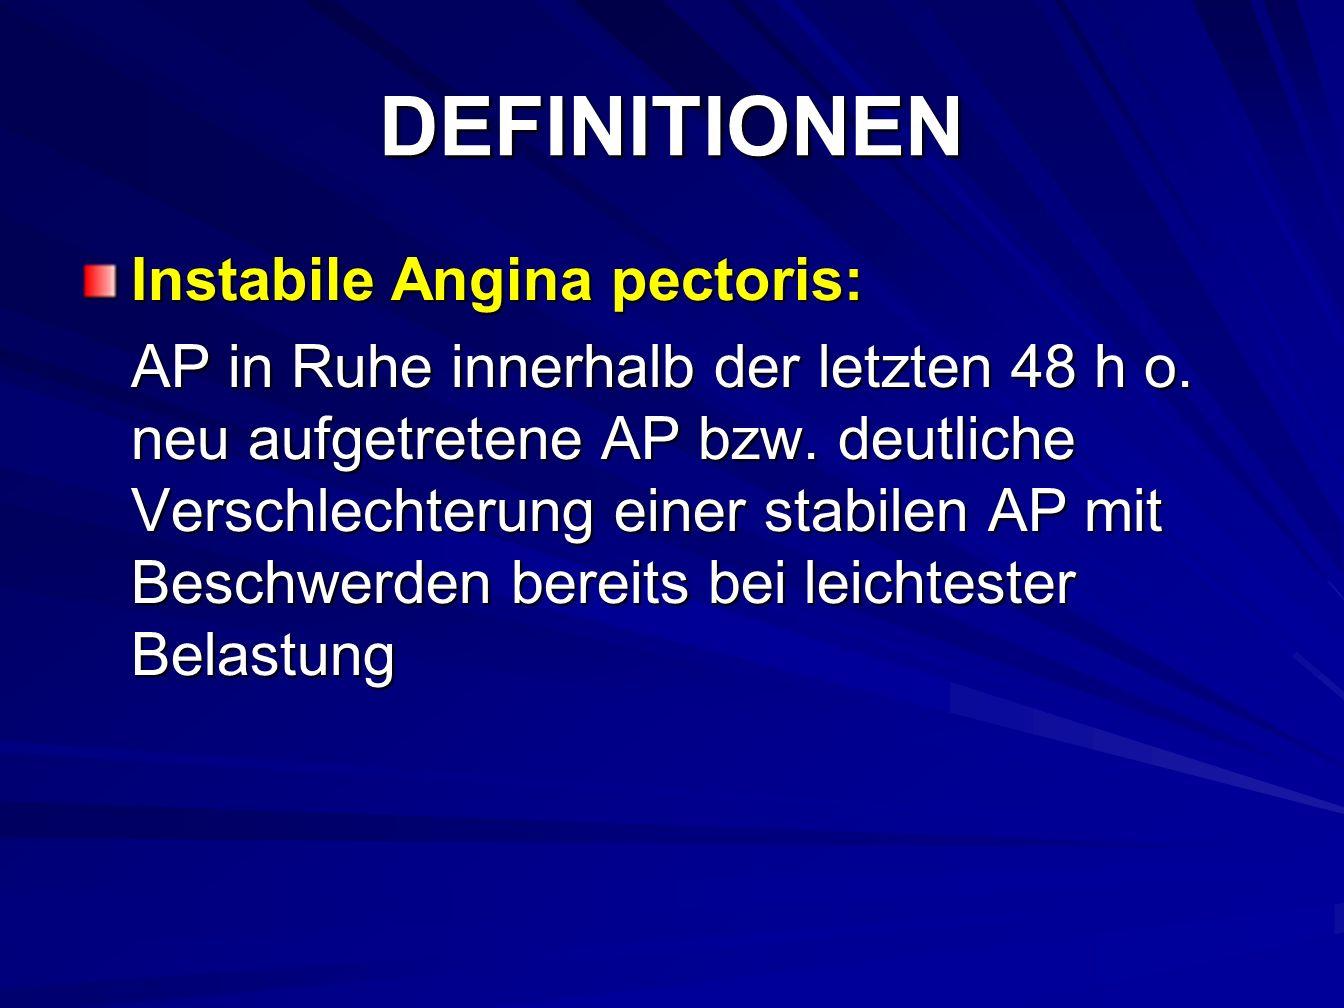 DEFINITIONEN Instabile Angina pectoris: AP in Ruhe innerhalb der letzten 48 h o.